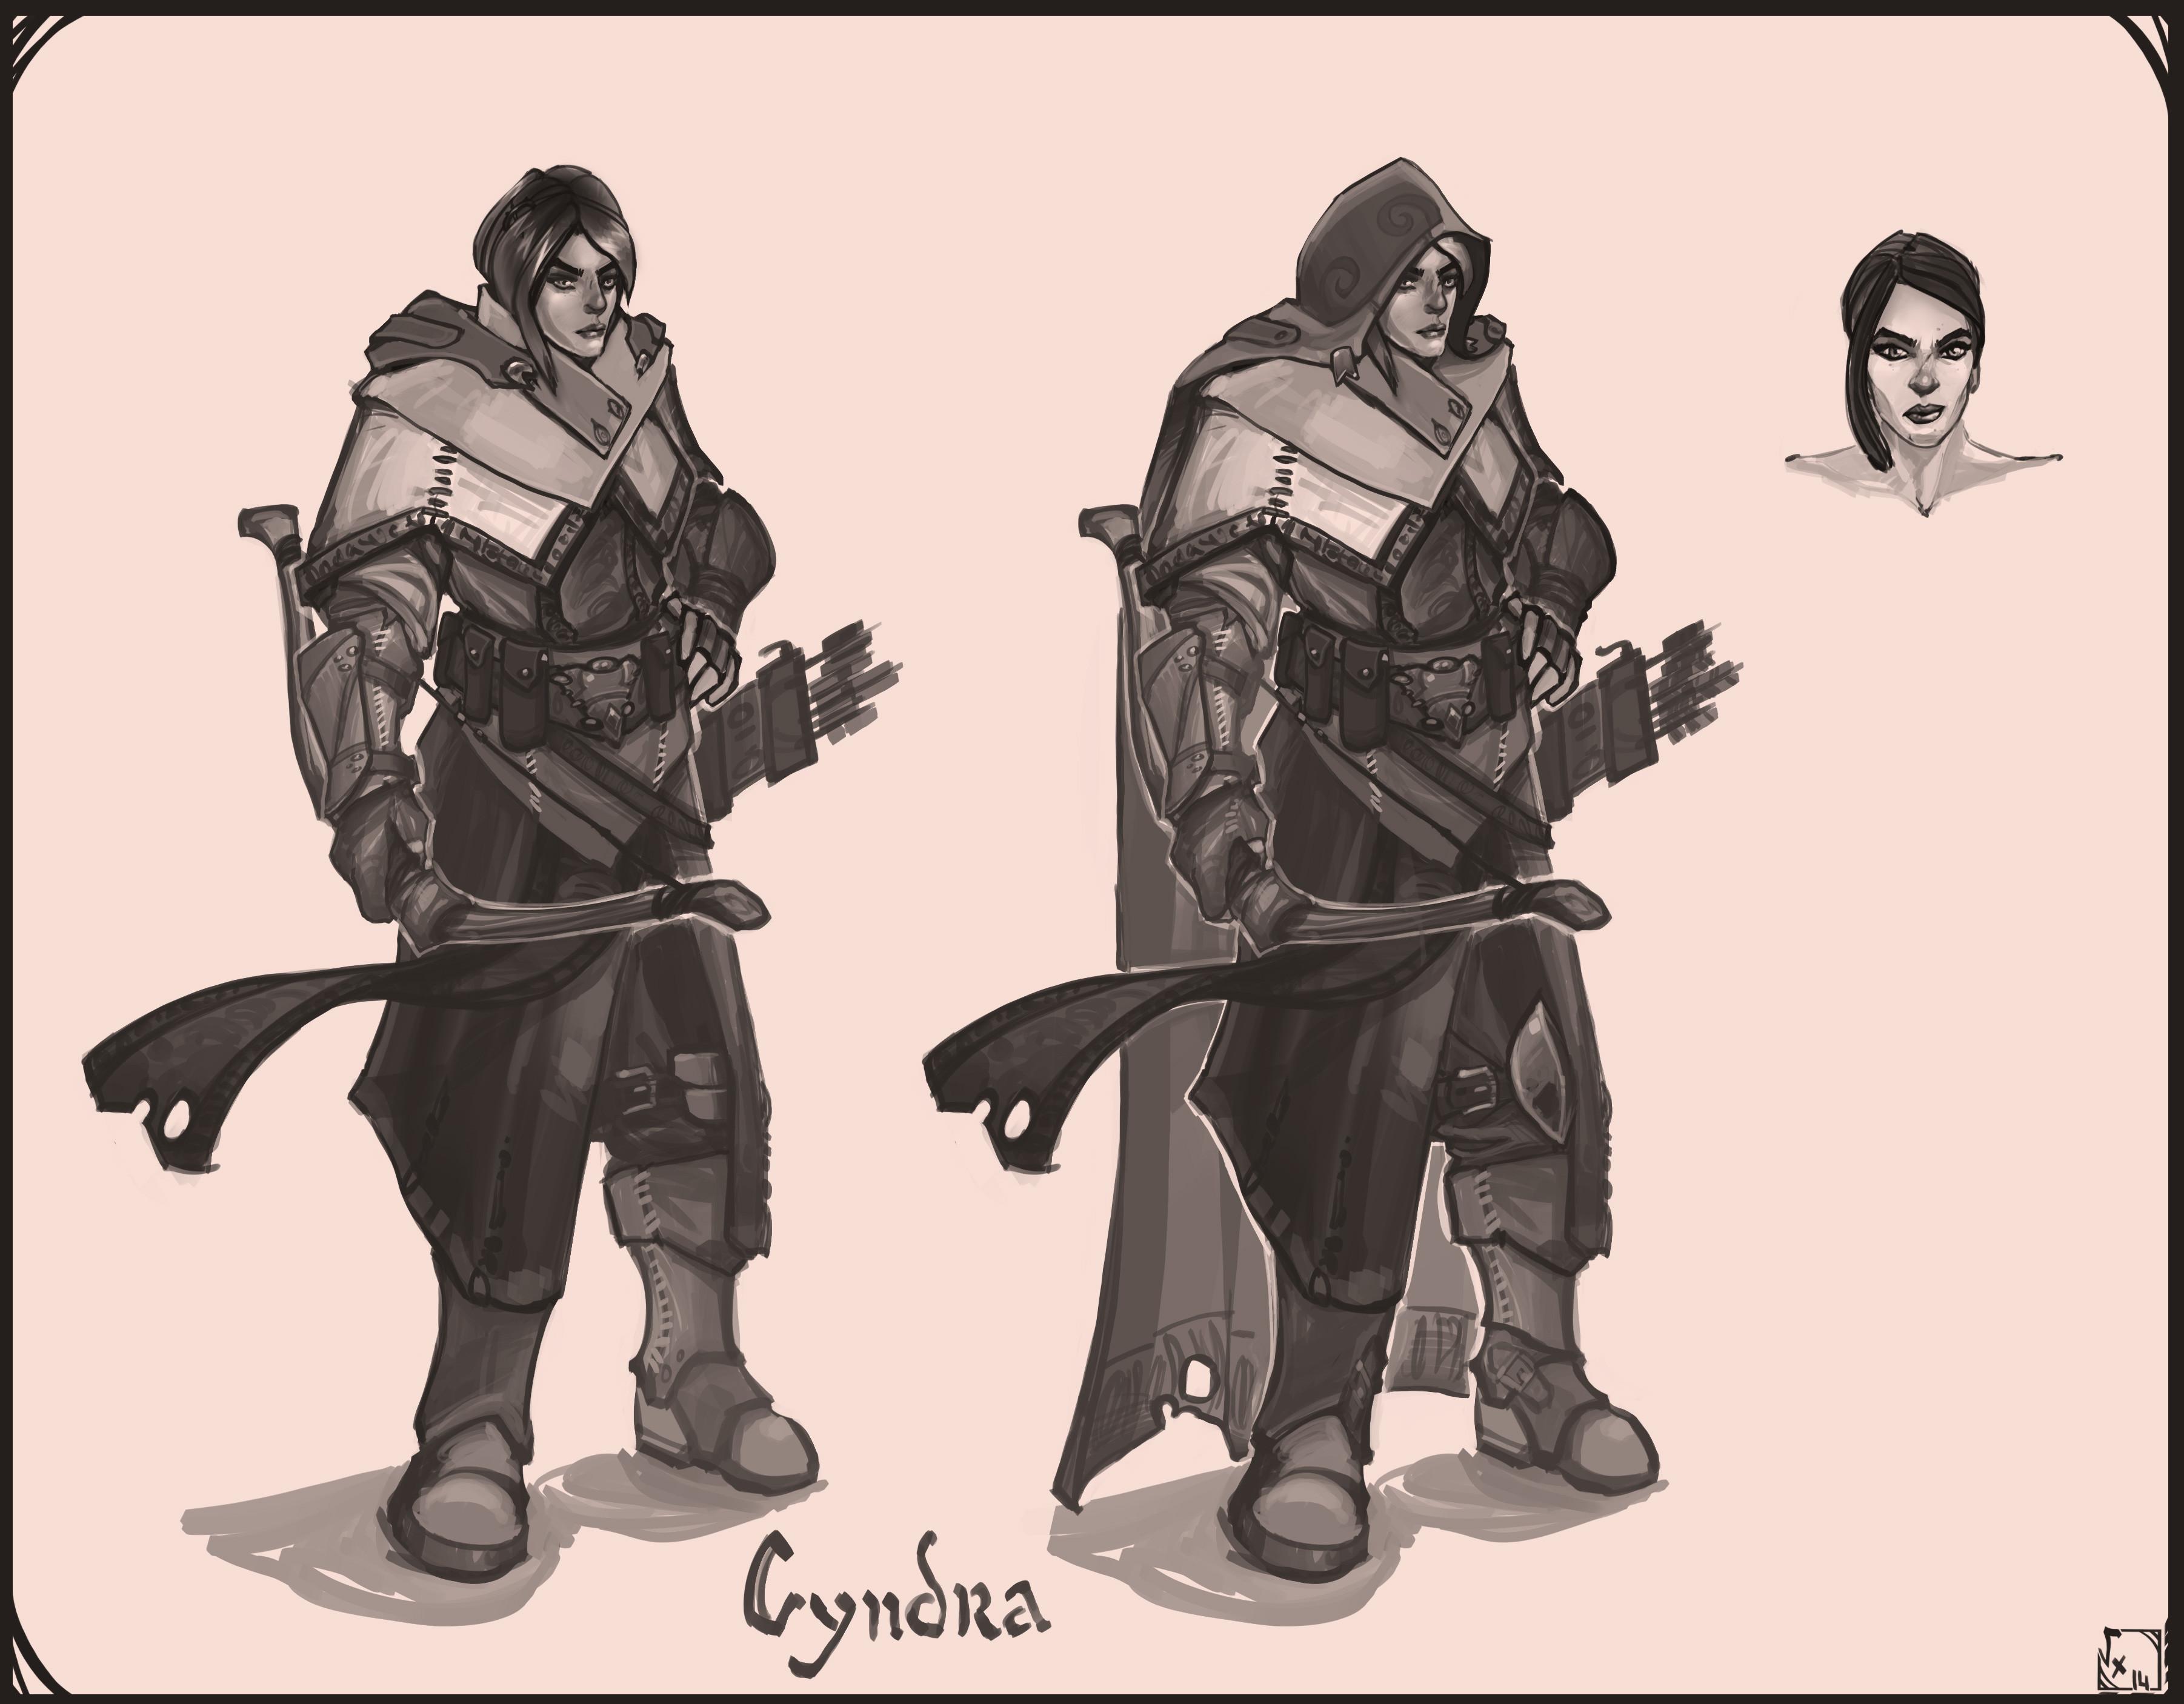 Cyndra - Secondary Character